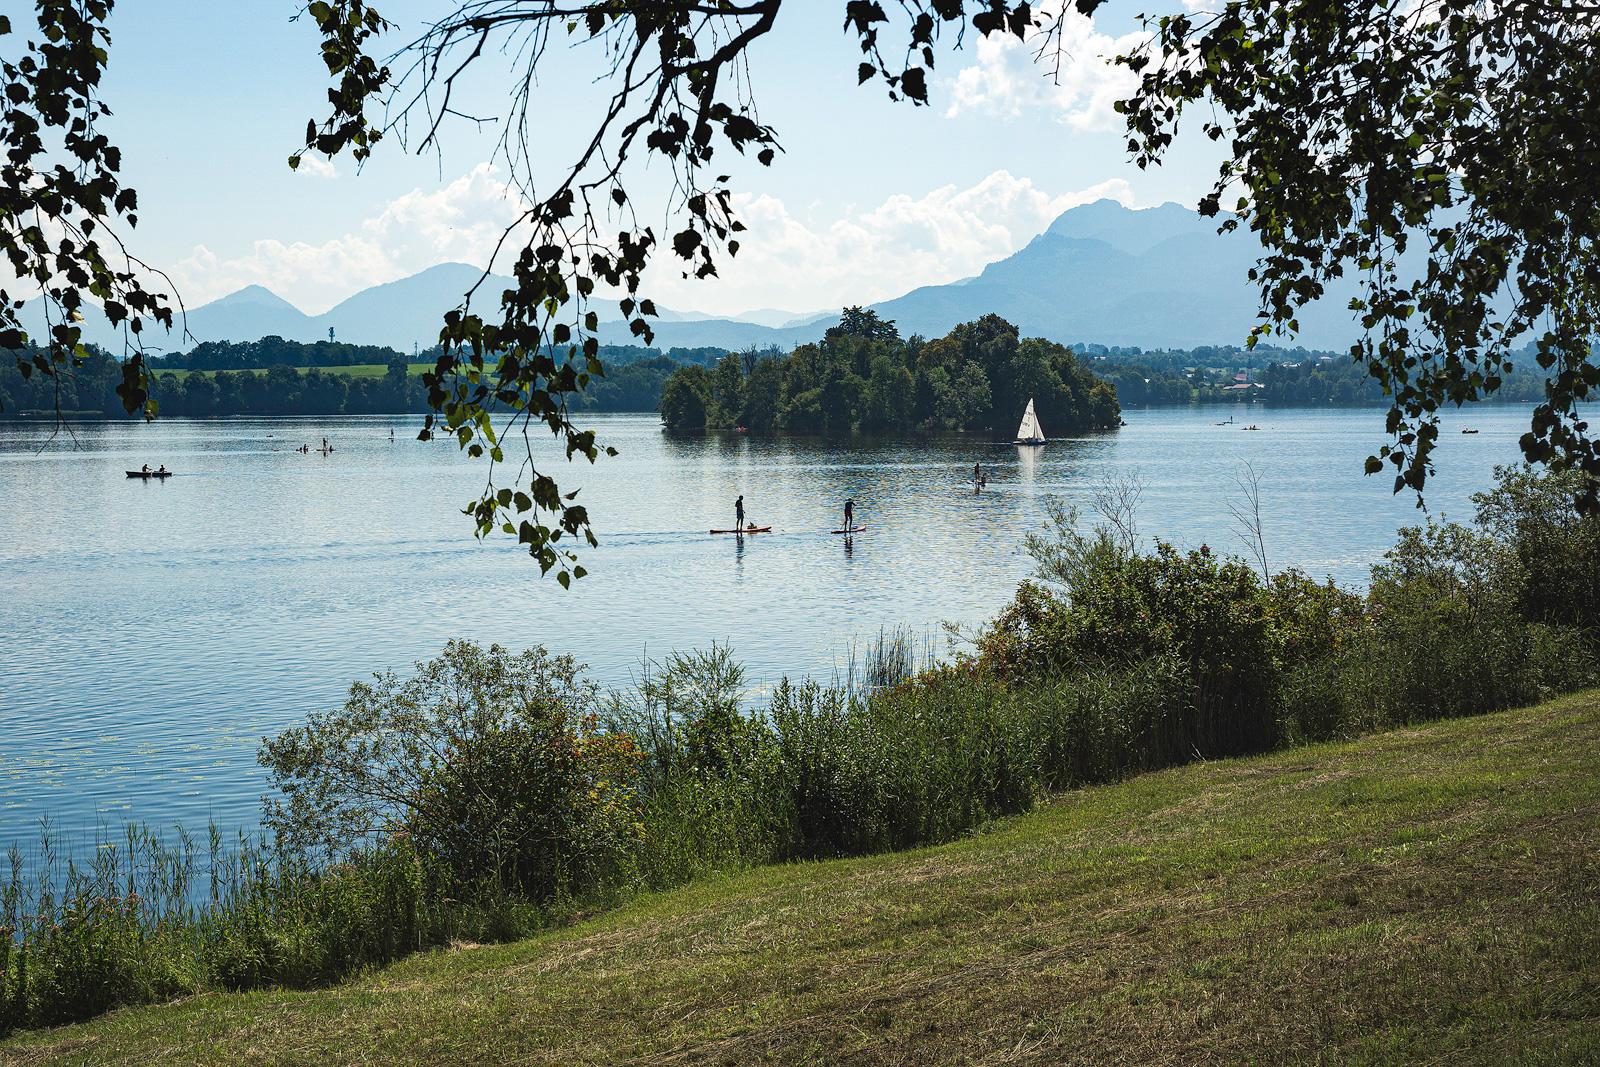 Uffing am Staffelsee, Badebereich